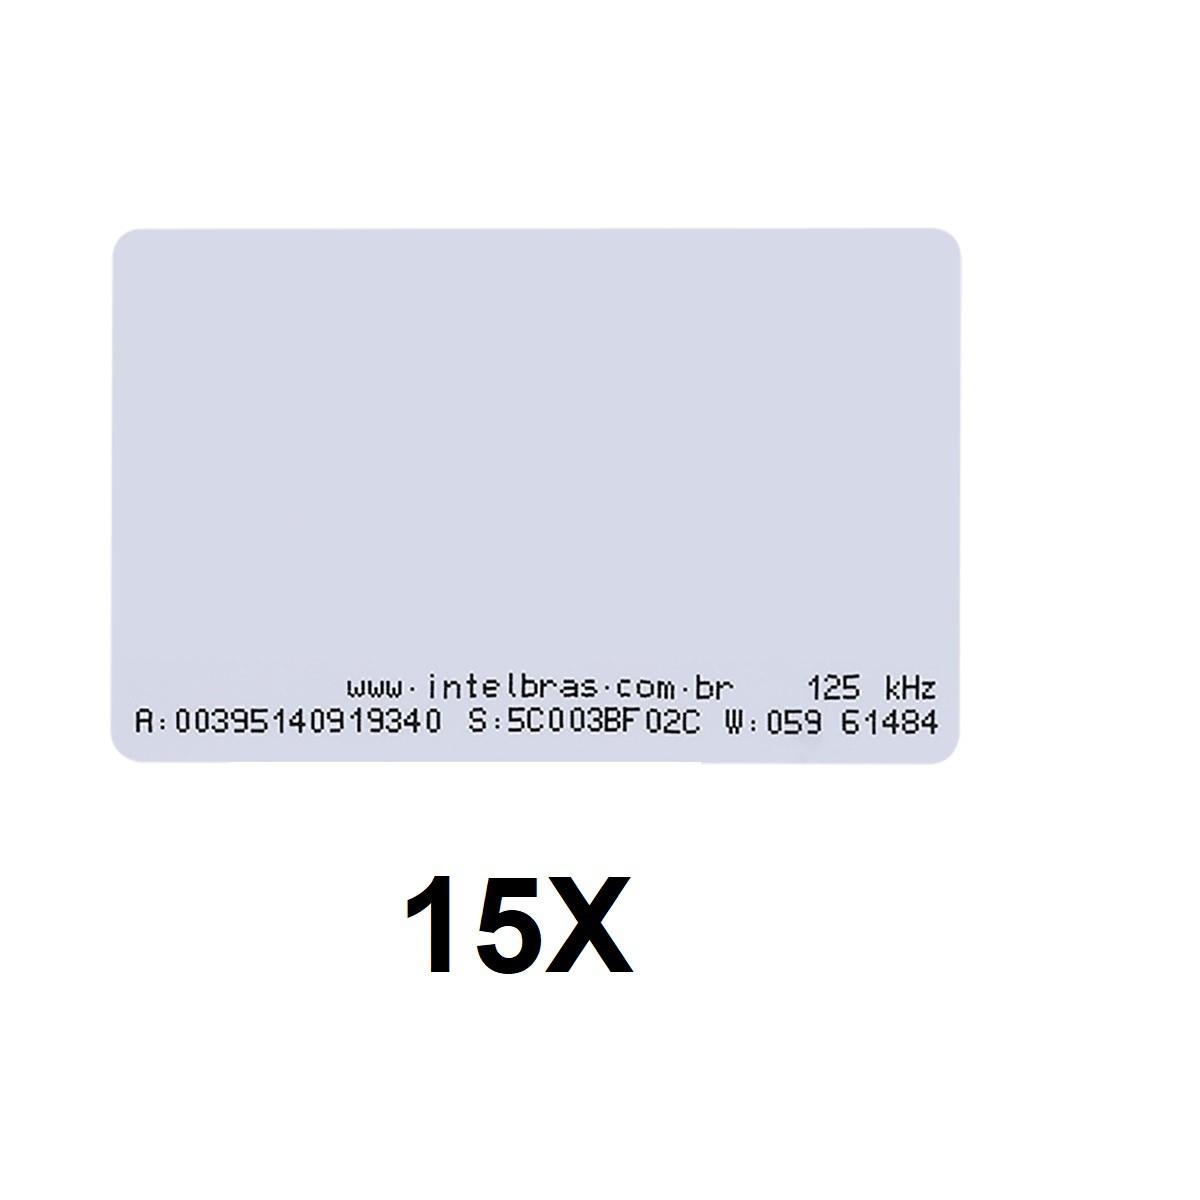 Kit 15 Cartões de Proximidade RFID 125 kHz Intelbras TH 2000